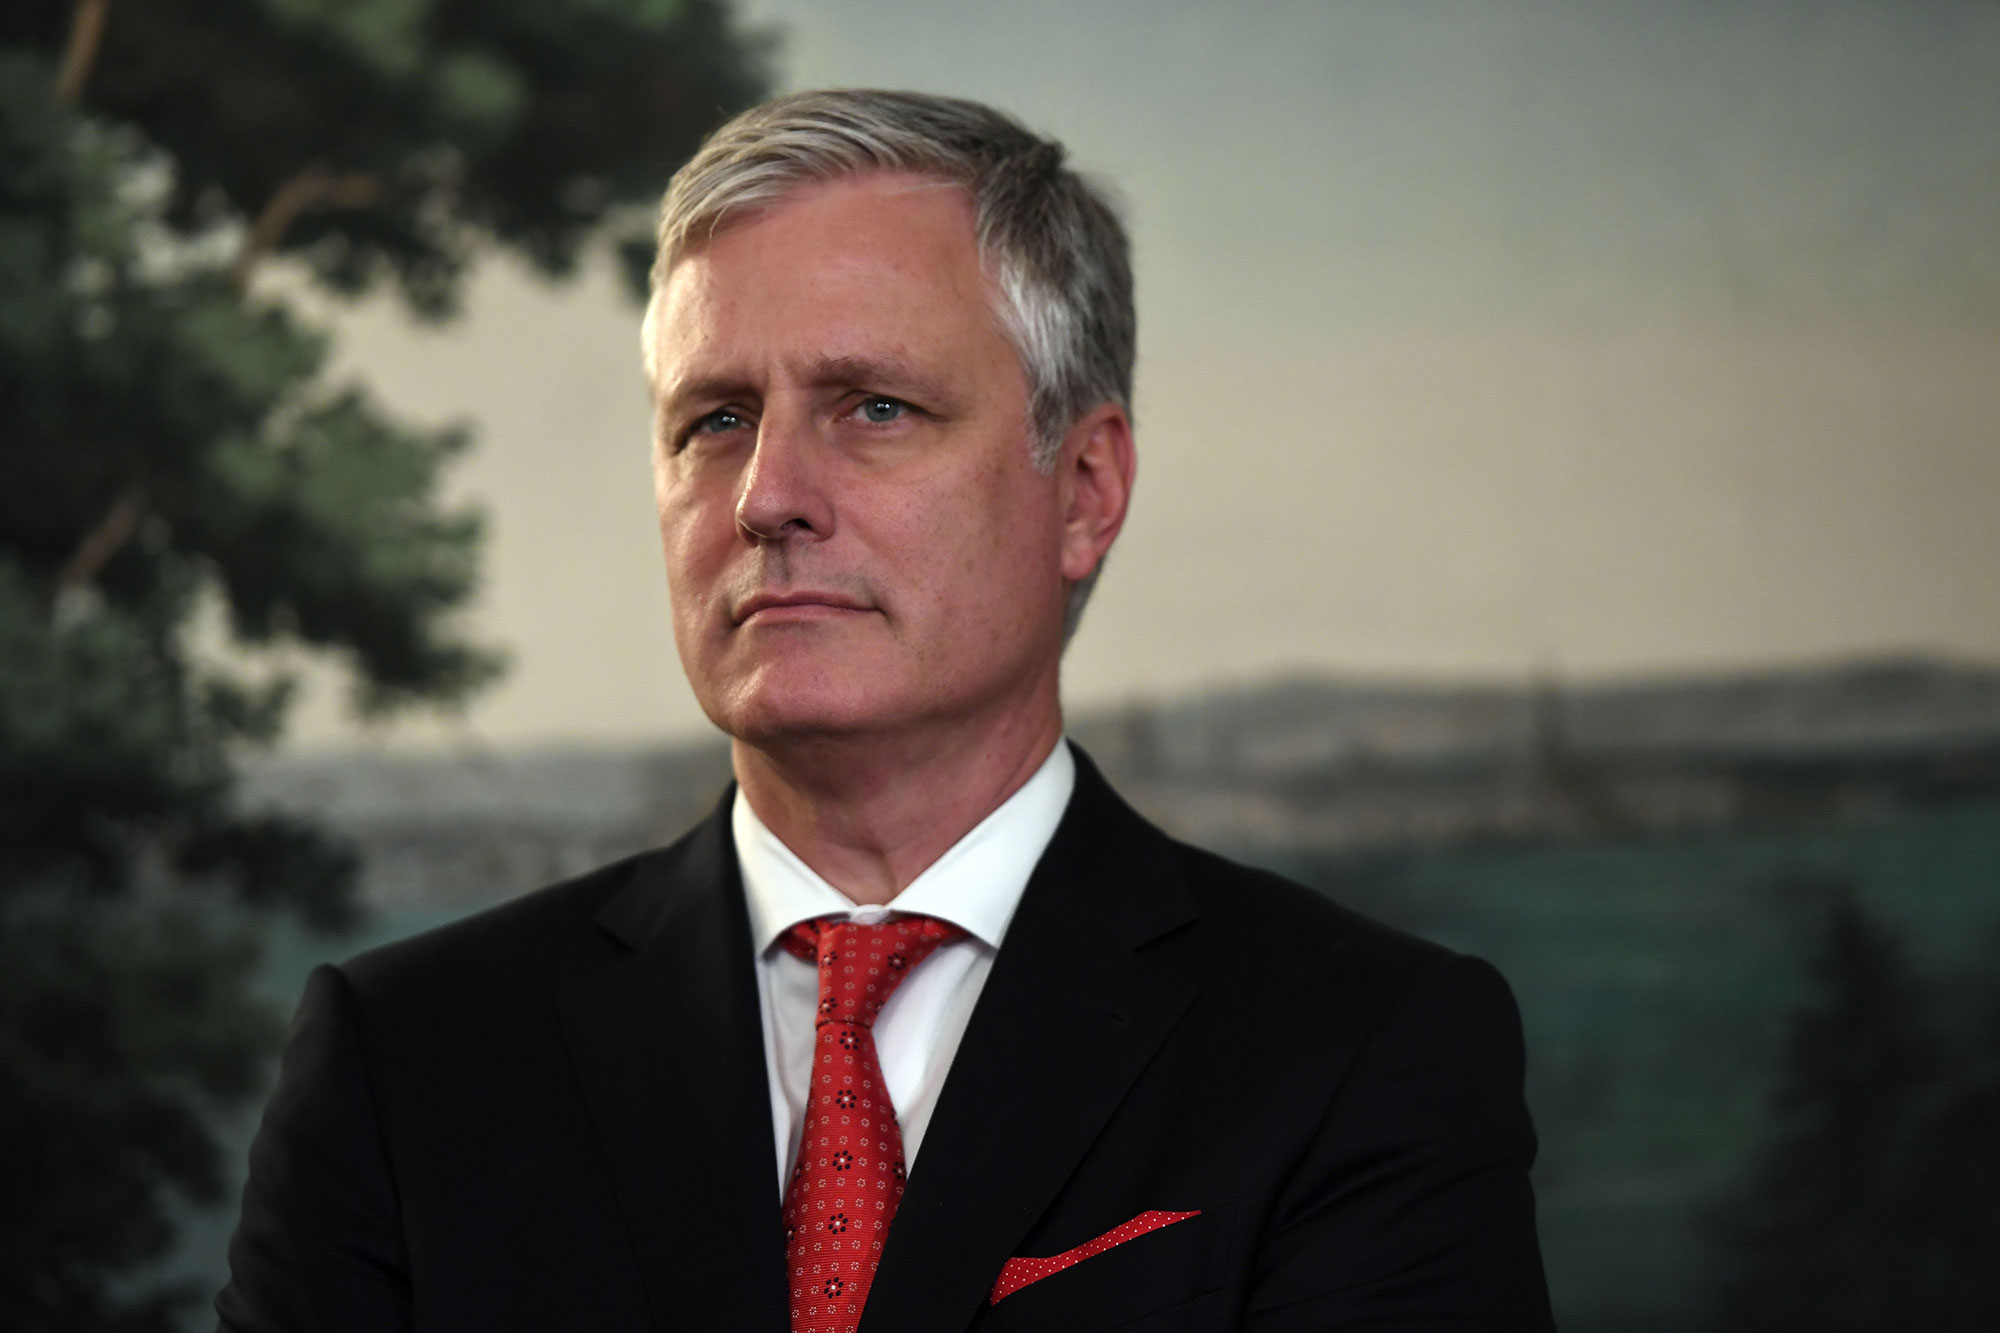 National security adviser Robert O'Brien on October 23, 2019.